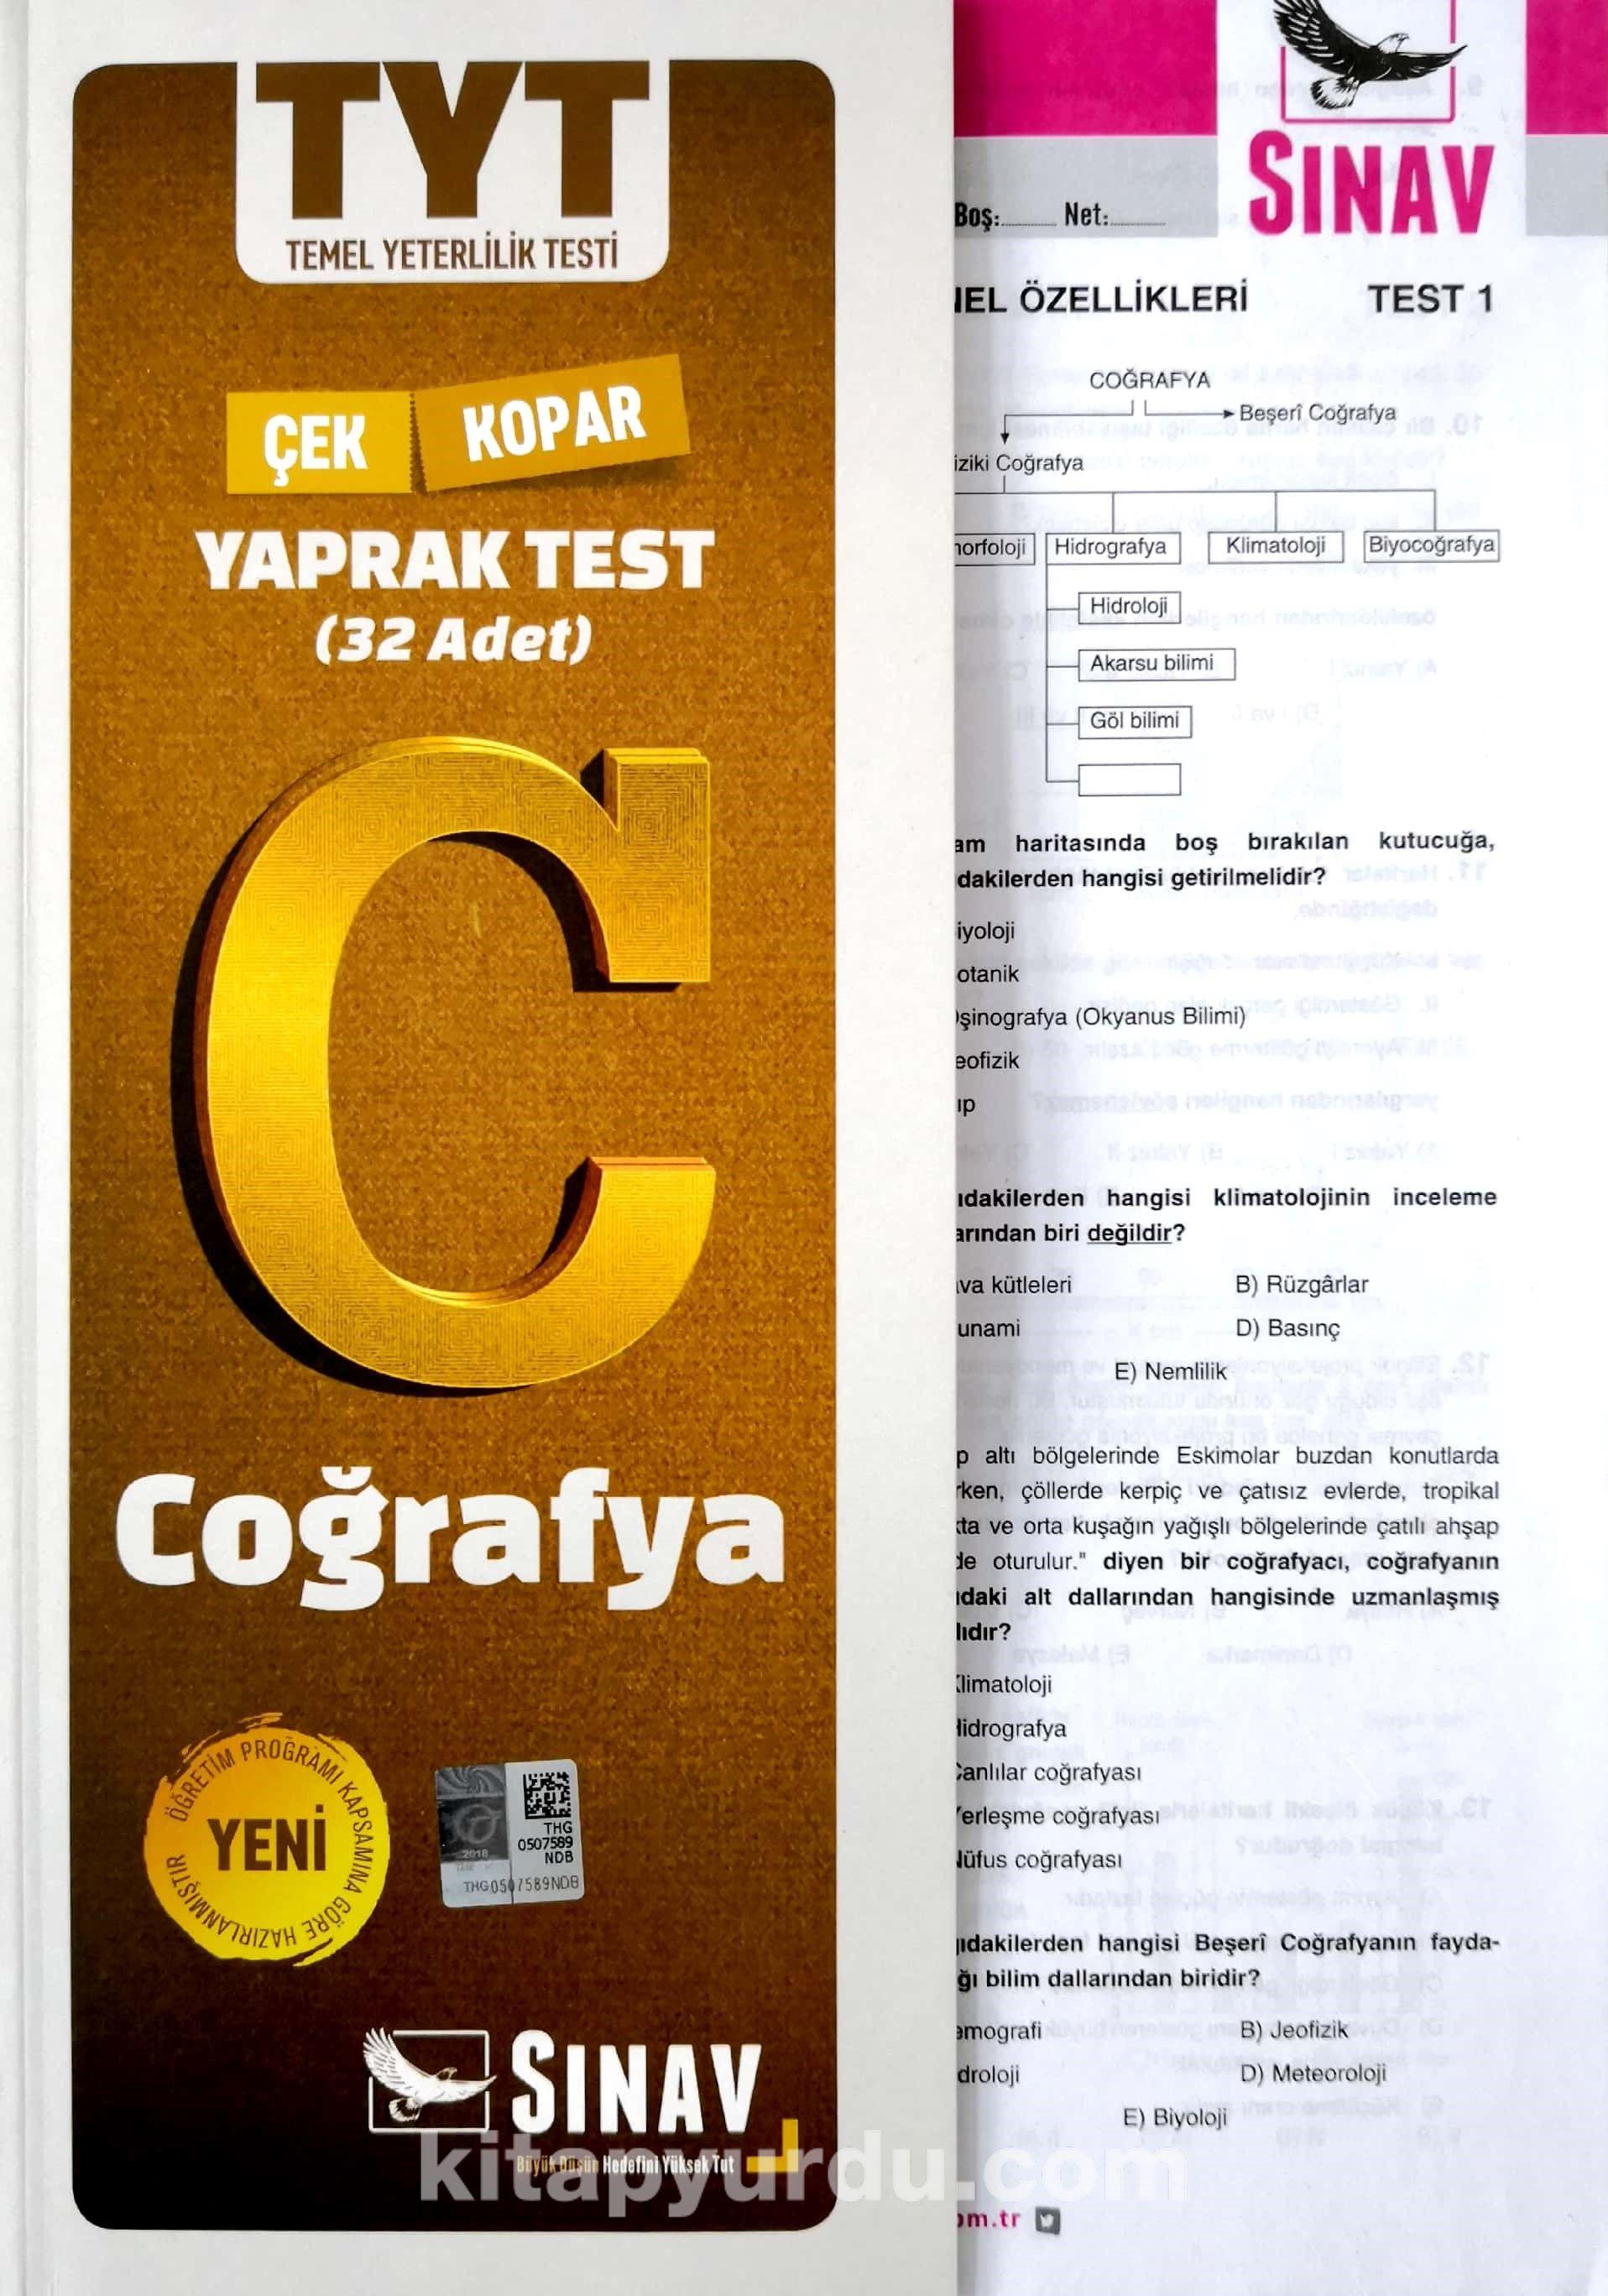 TYT Coğrafya Çek Kopar Yaprak Test - Kollektif pdf epub